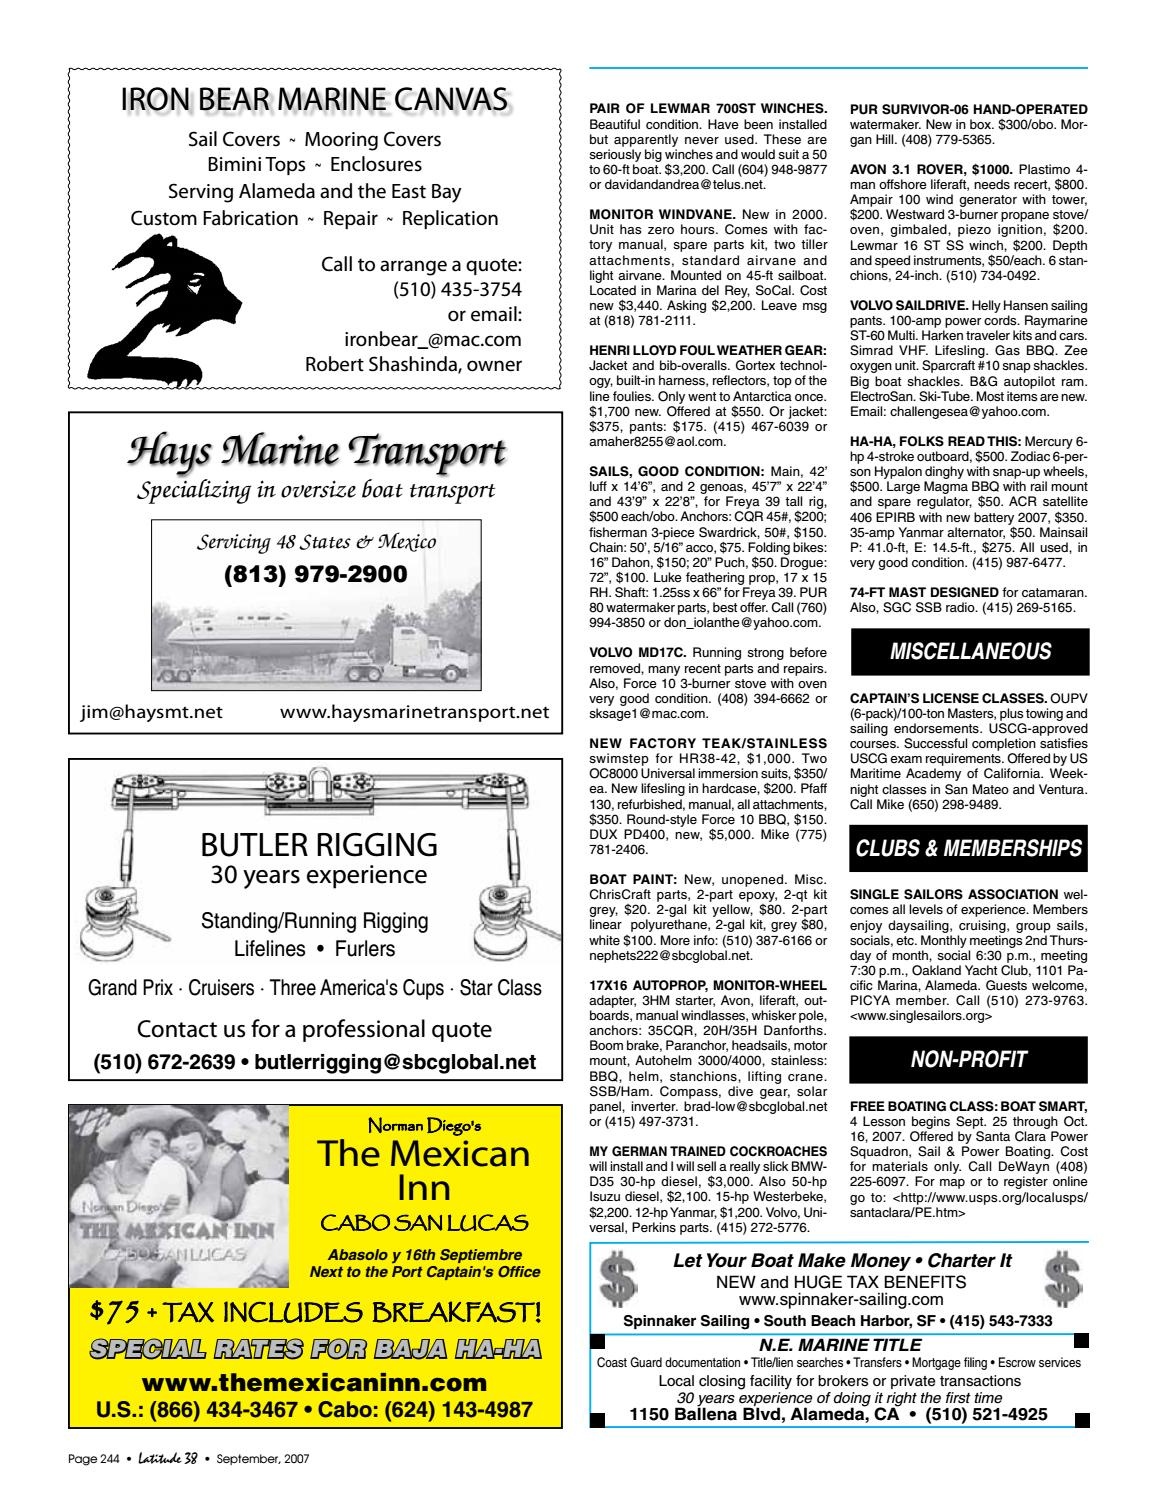 Latitude 38 September 2007 by Latitude 38 Media, LLC - issuu